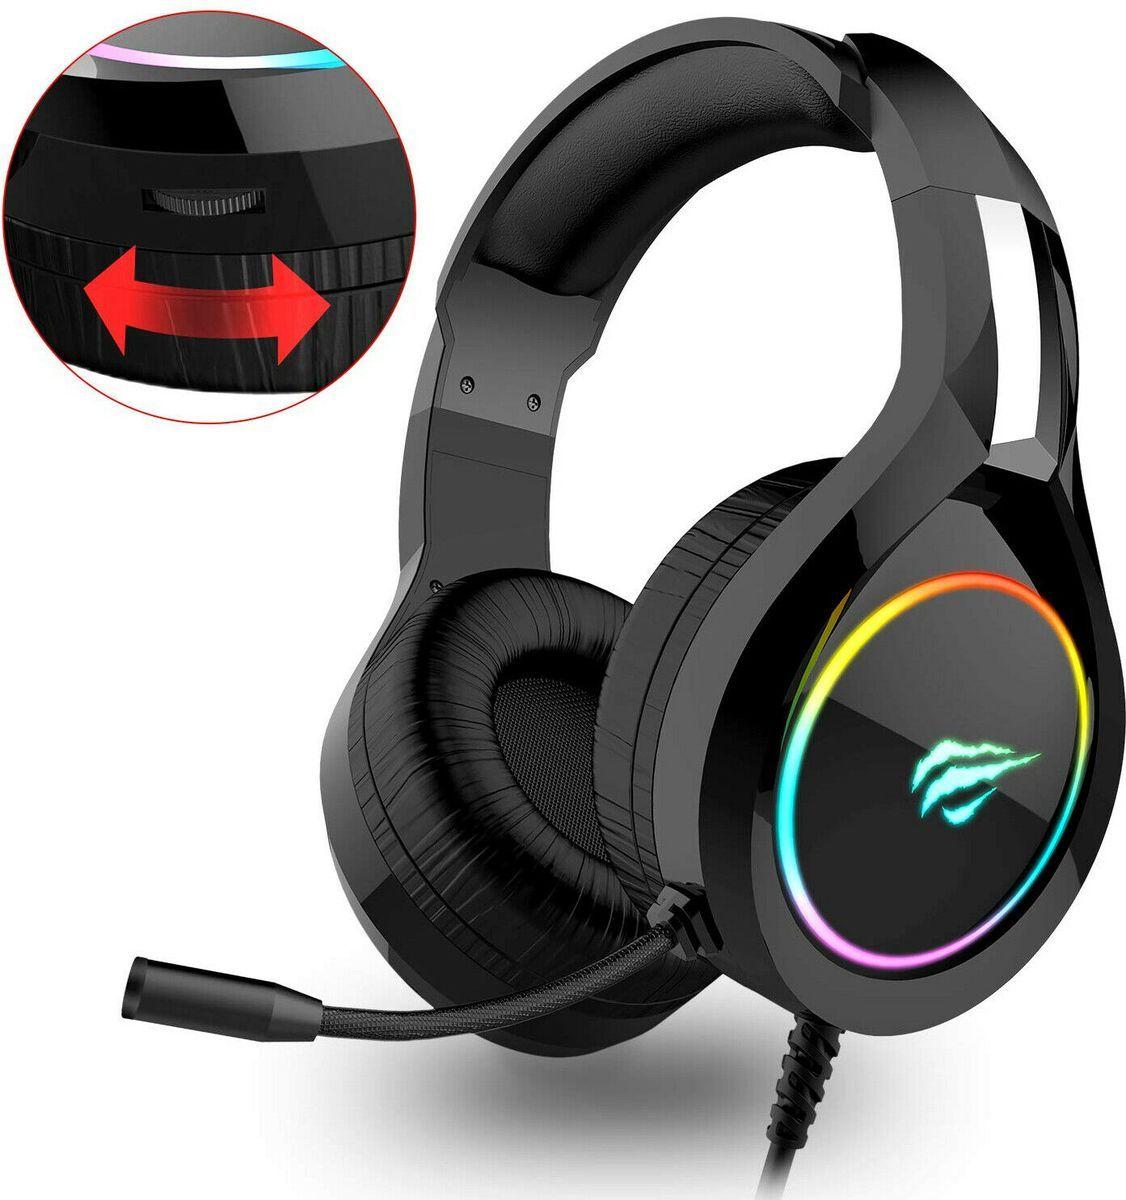 Neu Eingetroffen Havit Rgb Gaming Headset Ps4 Xbox One Nintendo Switch Surround Sound Schwarz Ecommerce Onlines Gaming Headset Over Ear Kopfhorer Mikrofon